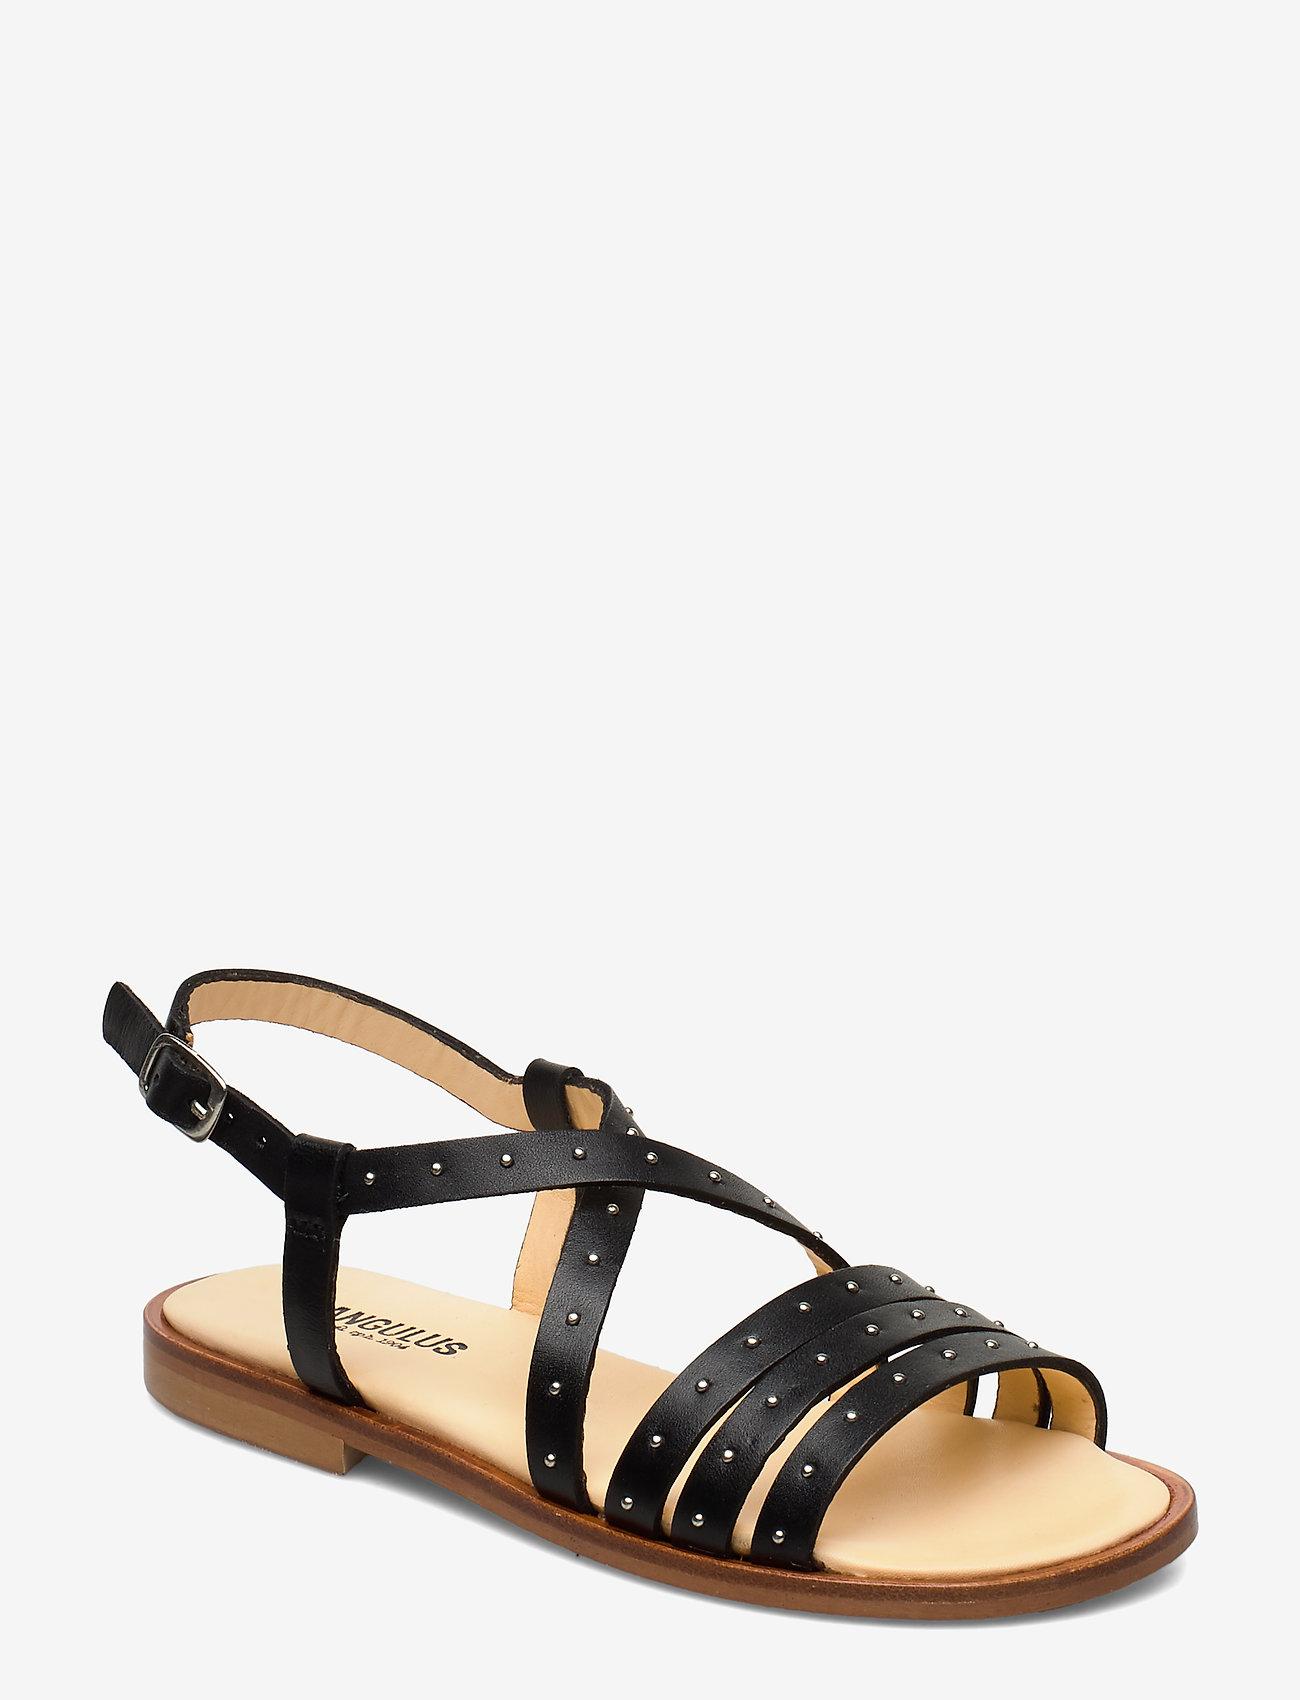 ANGULUS - Sandals - flat - open toe - op - platta sandaler - 1785 black - 0